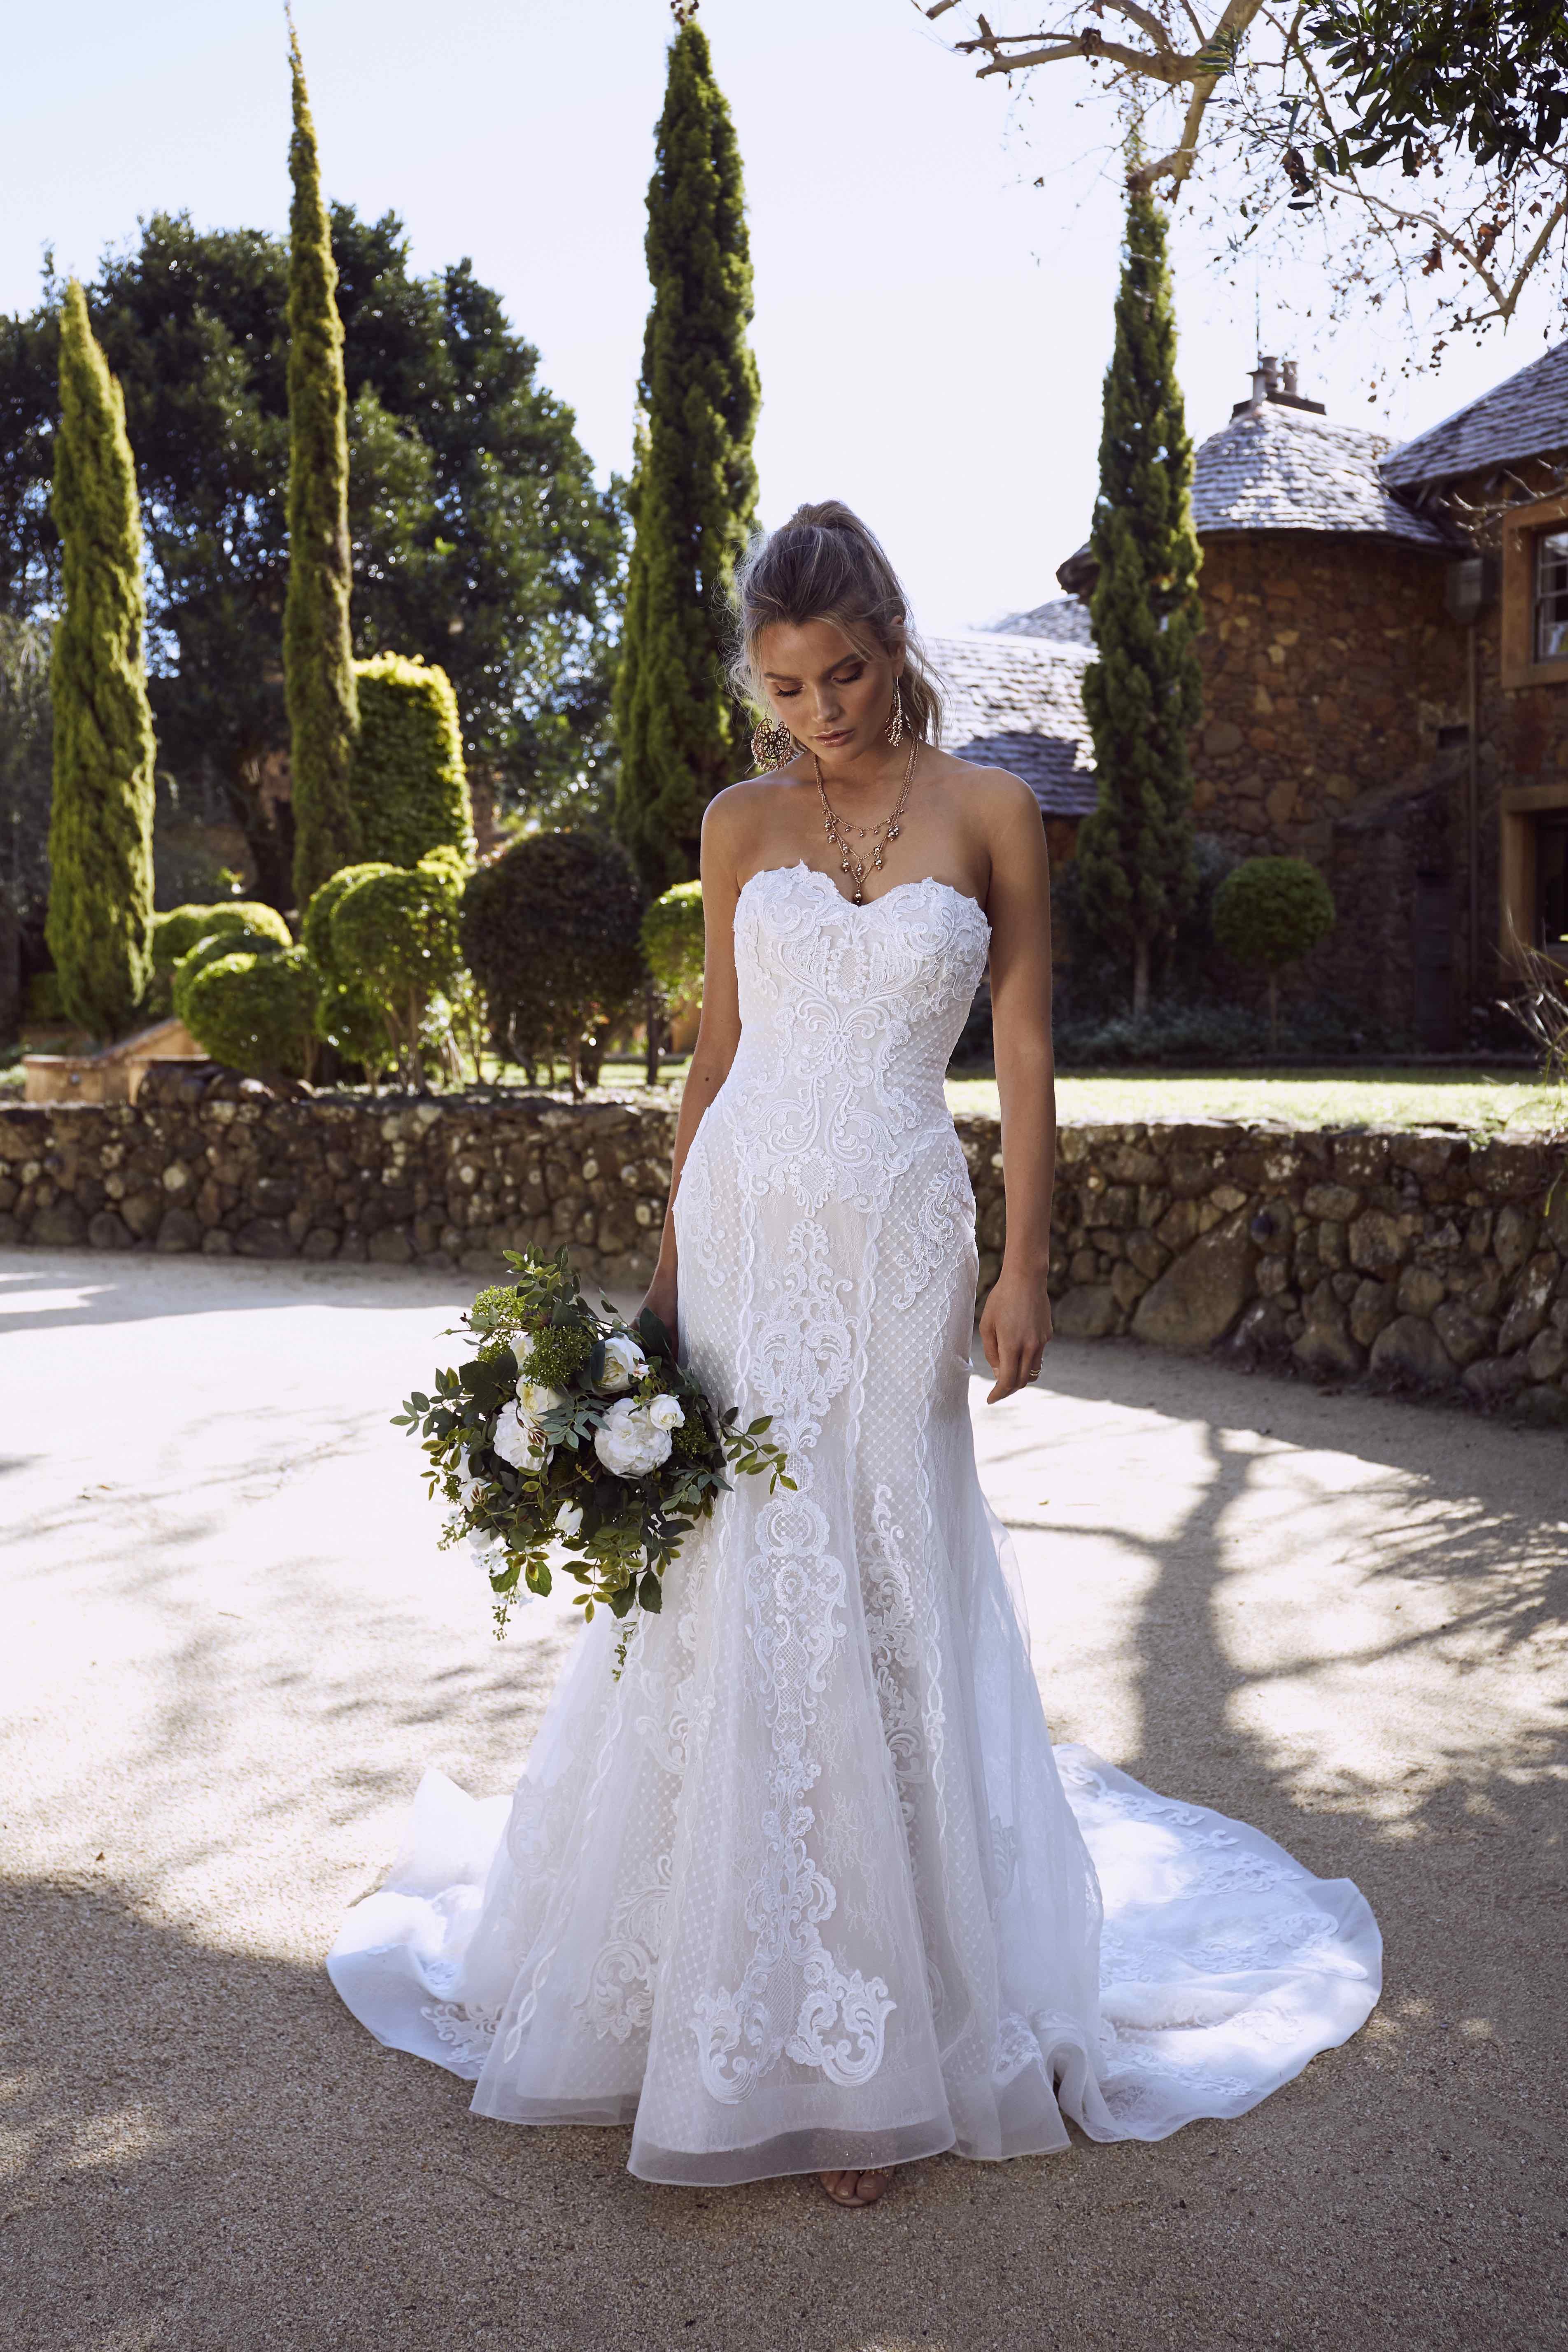 Sweetheart Wedding Dress.Romana Luv Bridal